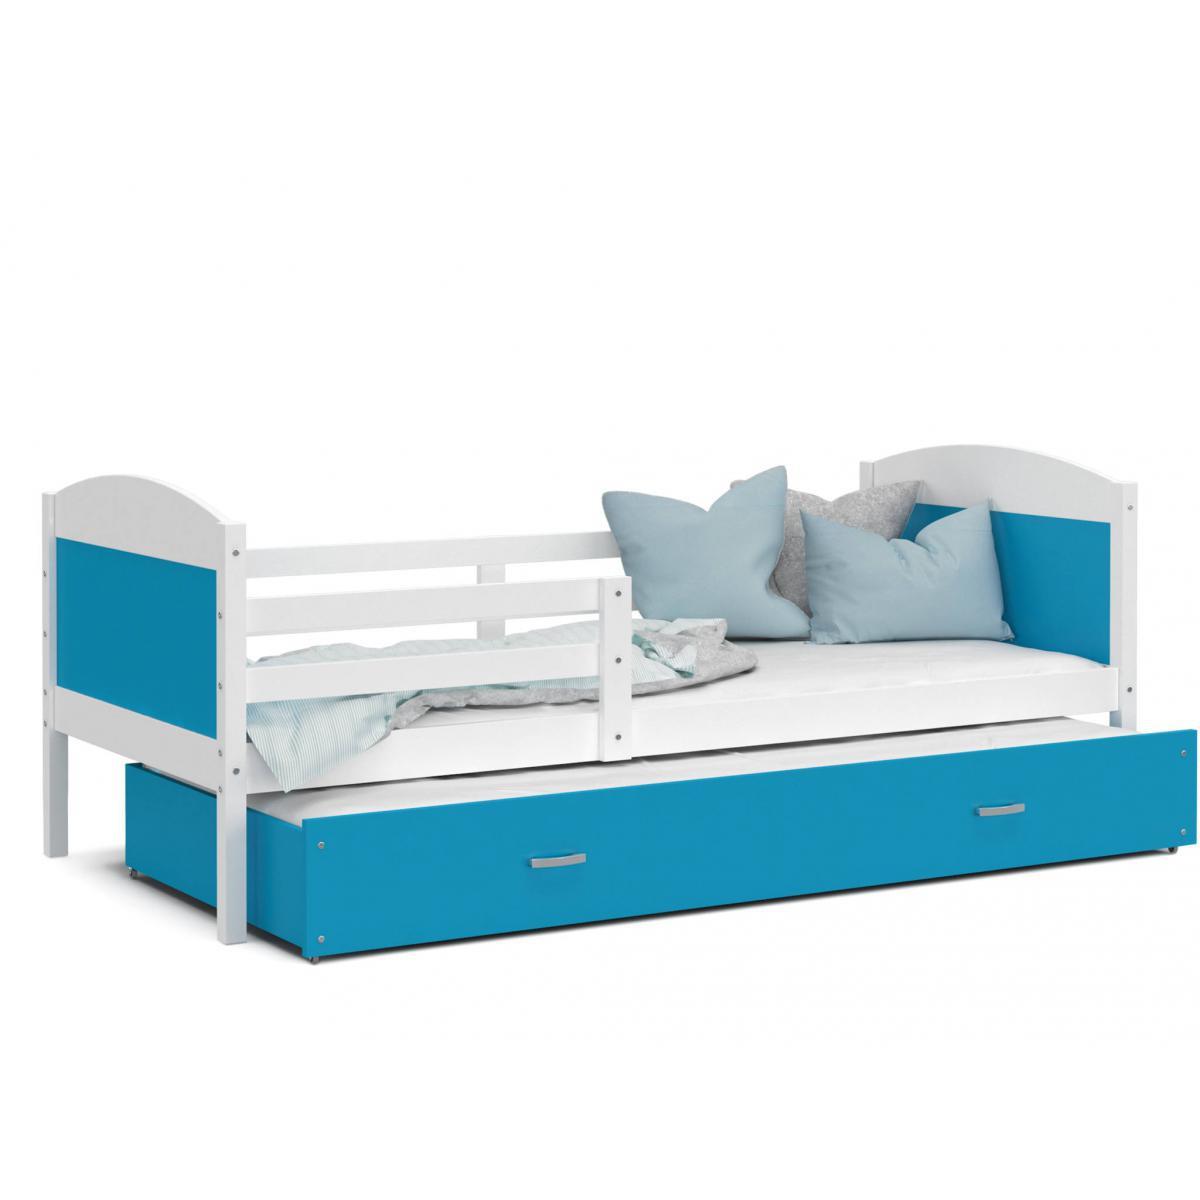 Kids Literie LIT Gigogne Mateo 90x190 Blanc - Bleu livré avec sommier, tiroir et matelas de 7cm OFFERT.